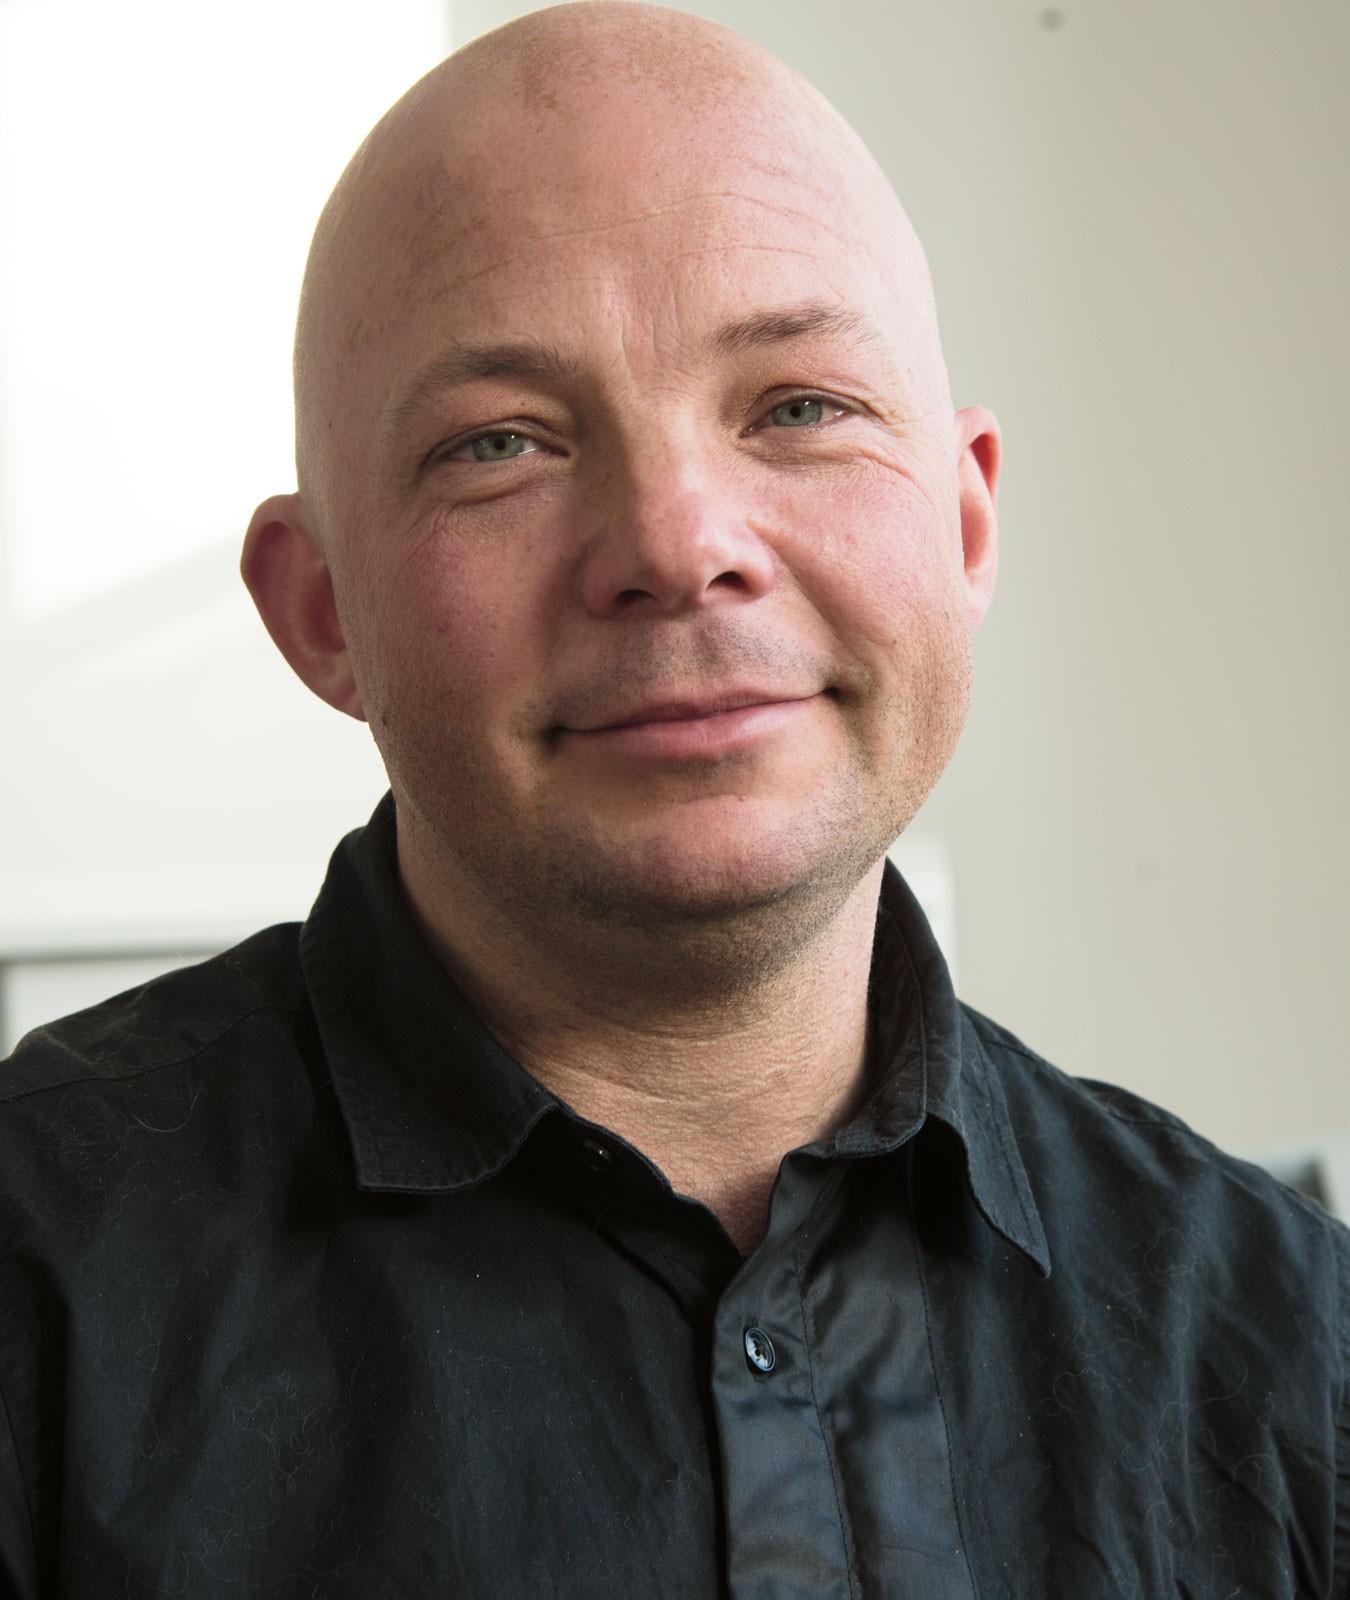 Fredrik Engdahl